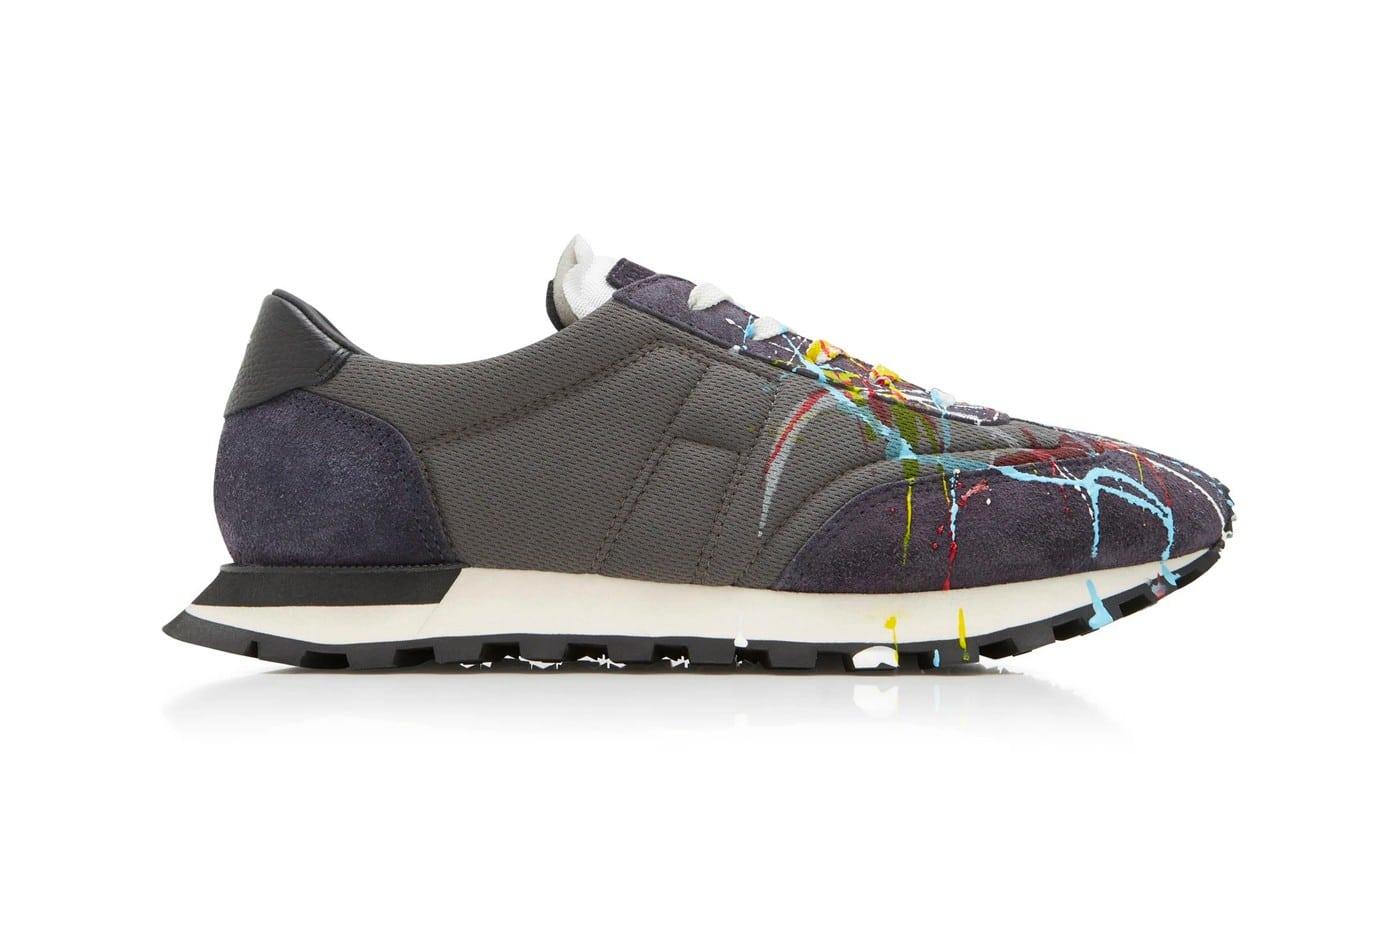 Maison Margiela Paint-Splattered Suede & Mesh Sneakers